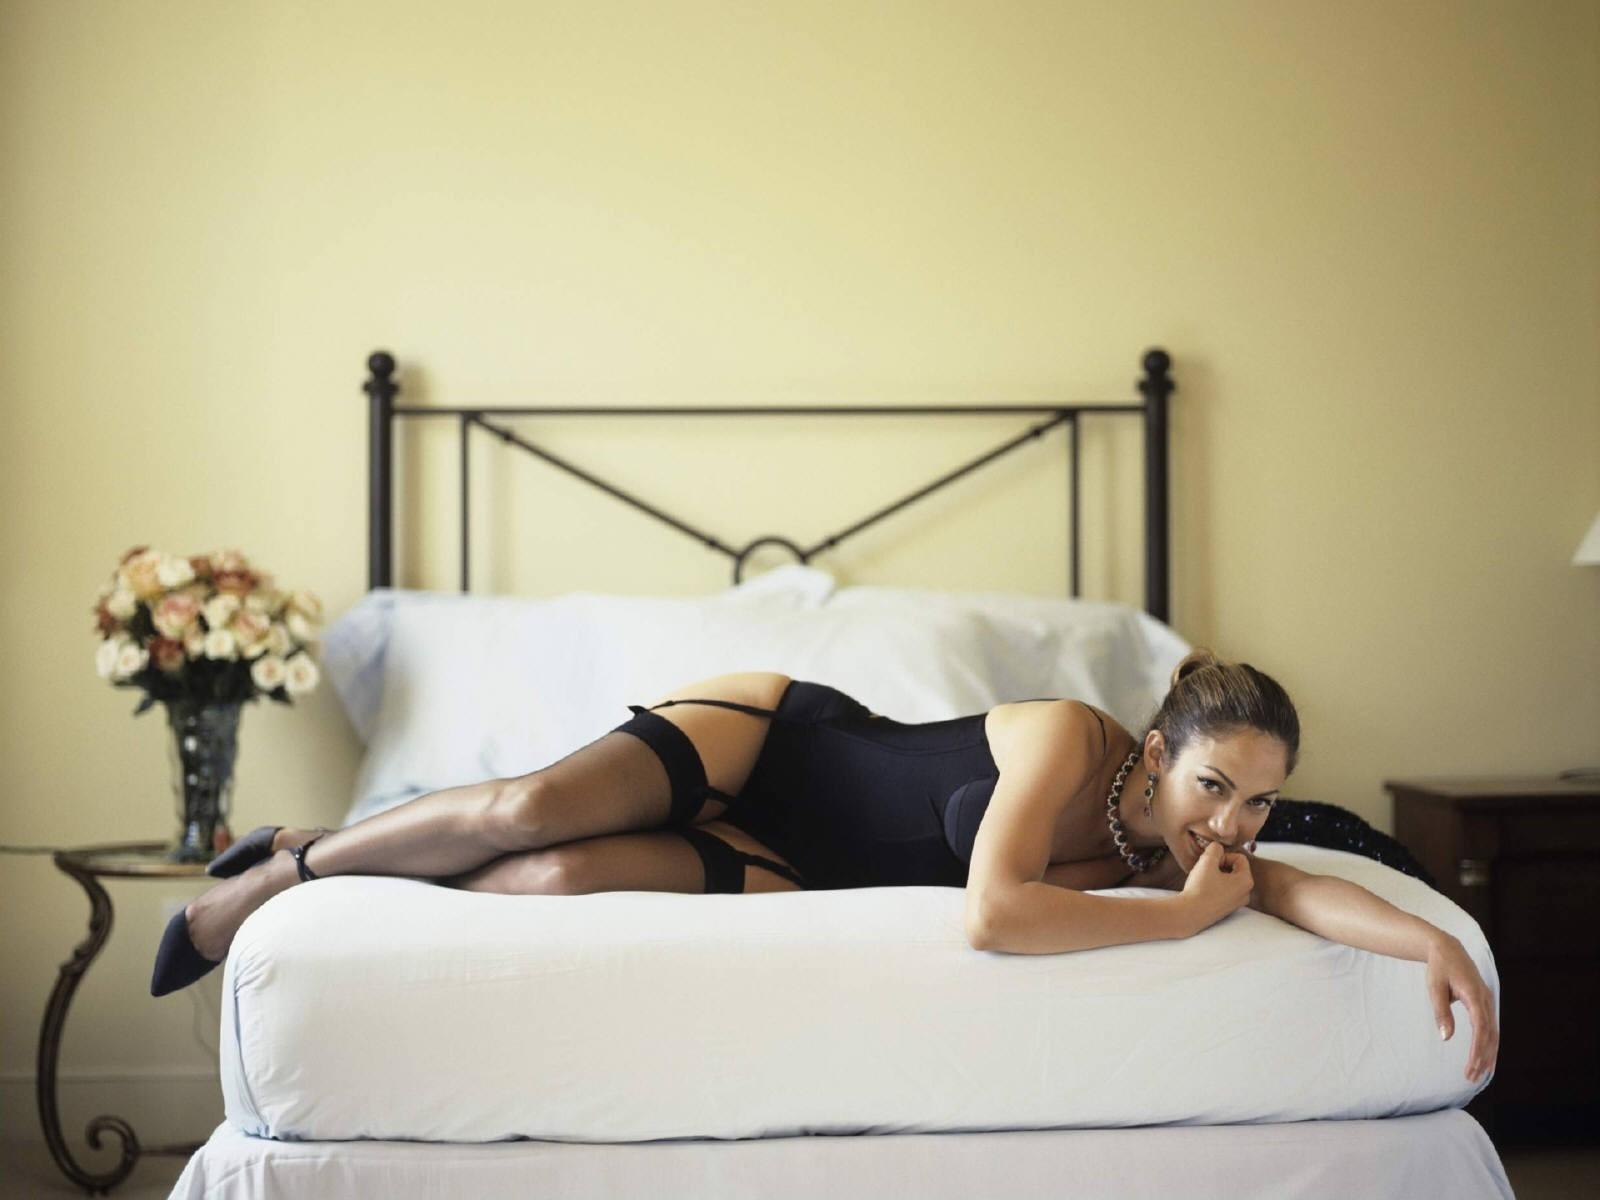 Wallpaper - tacchi alti e lingerie nera per Jennifer Lopez